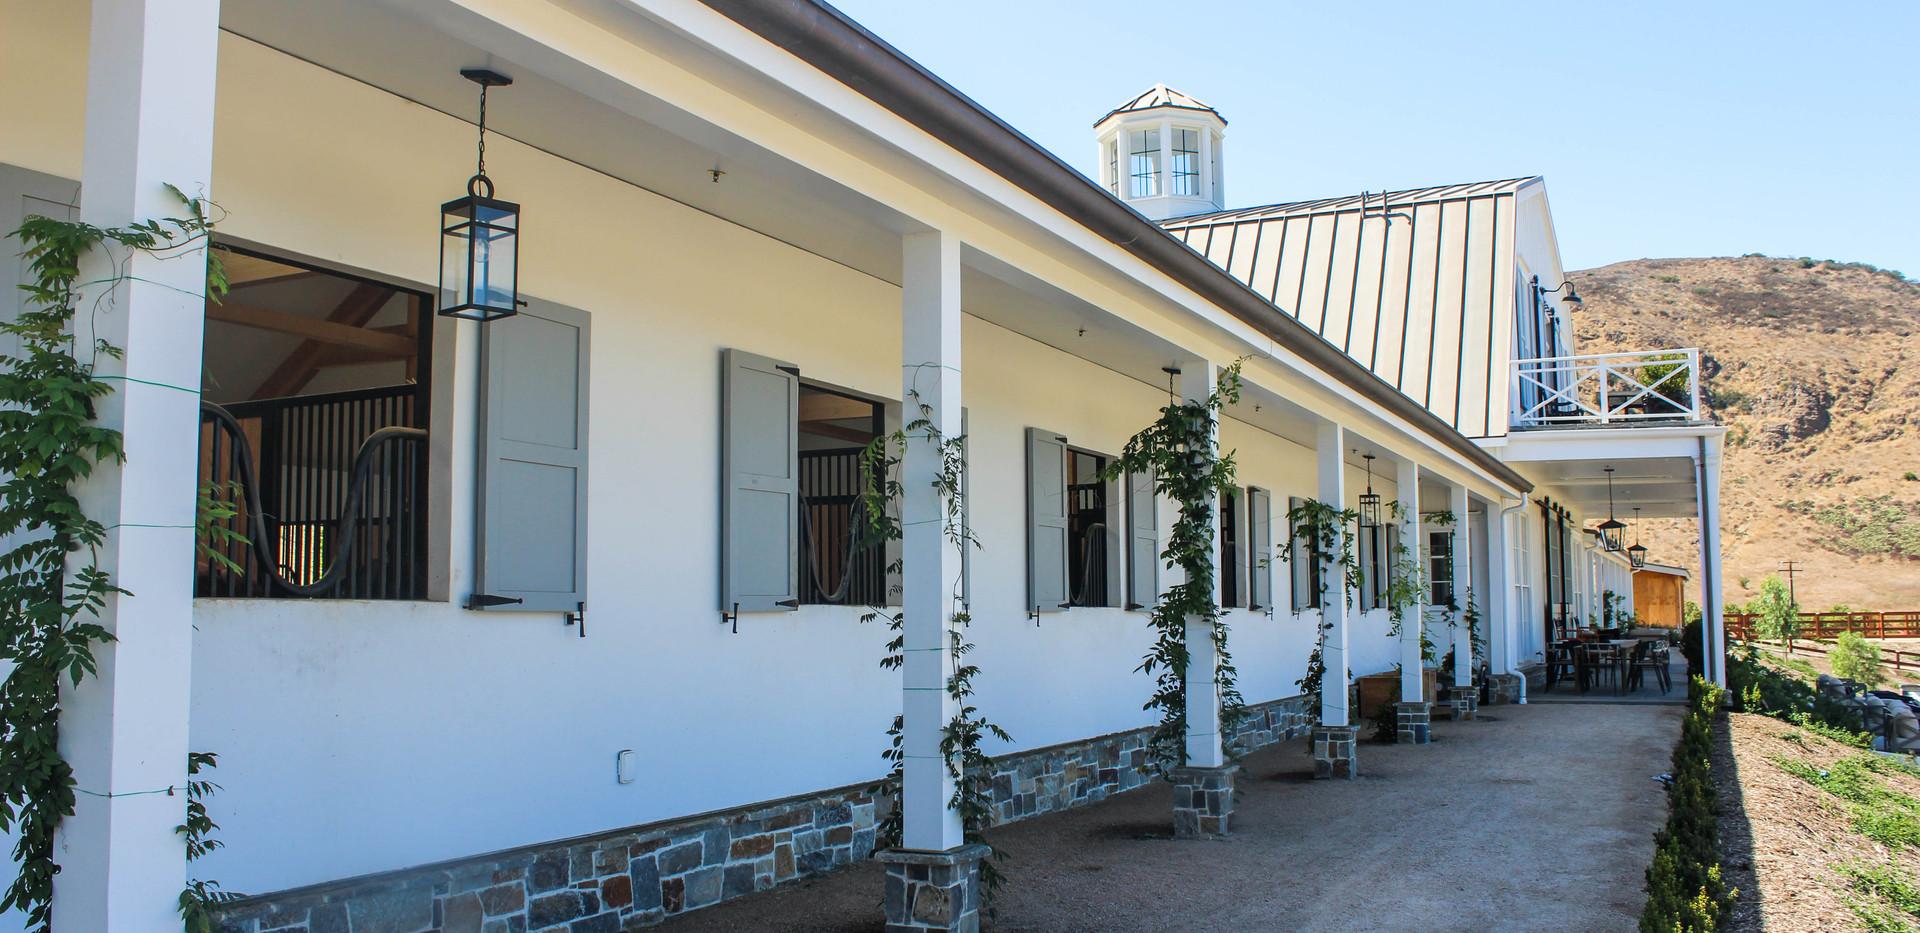 Q of E Farm - Home of Ingenium Farm - Stall Windows